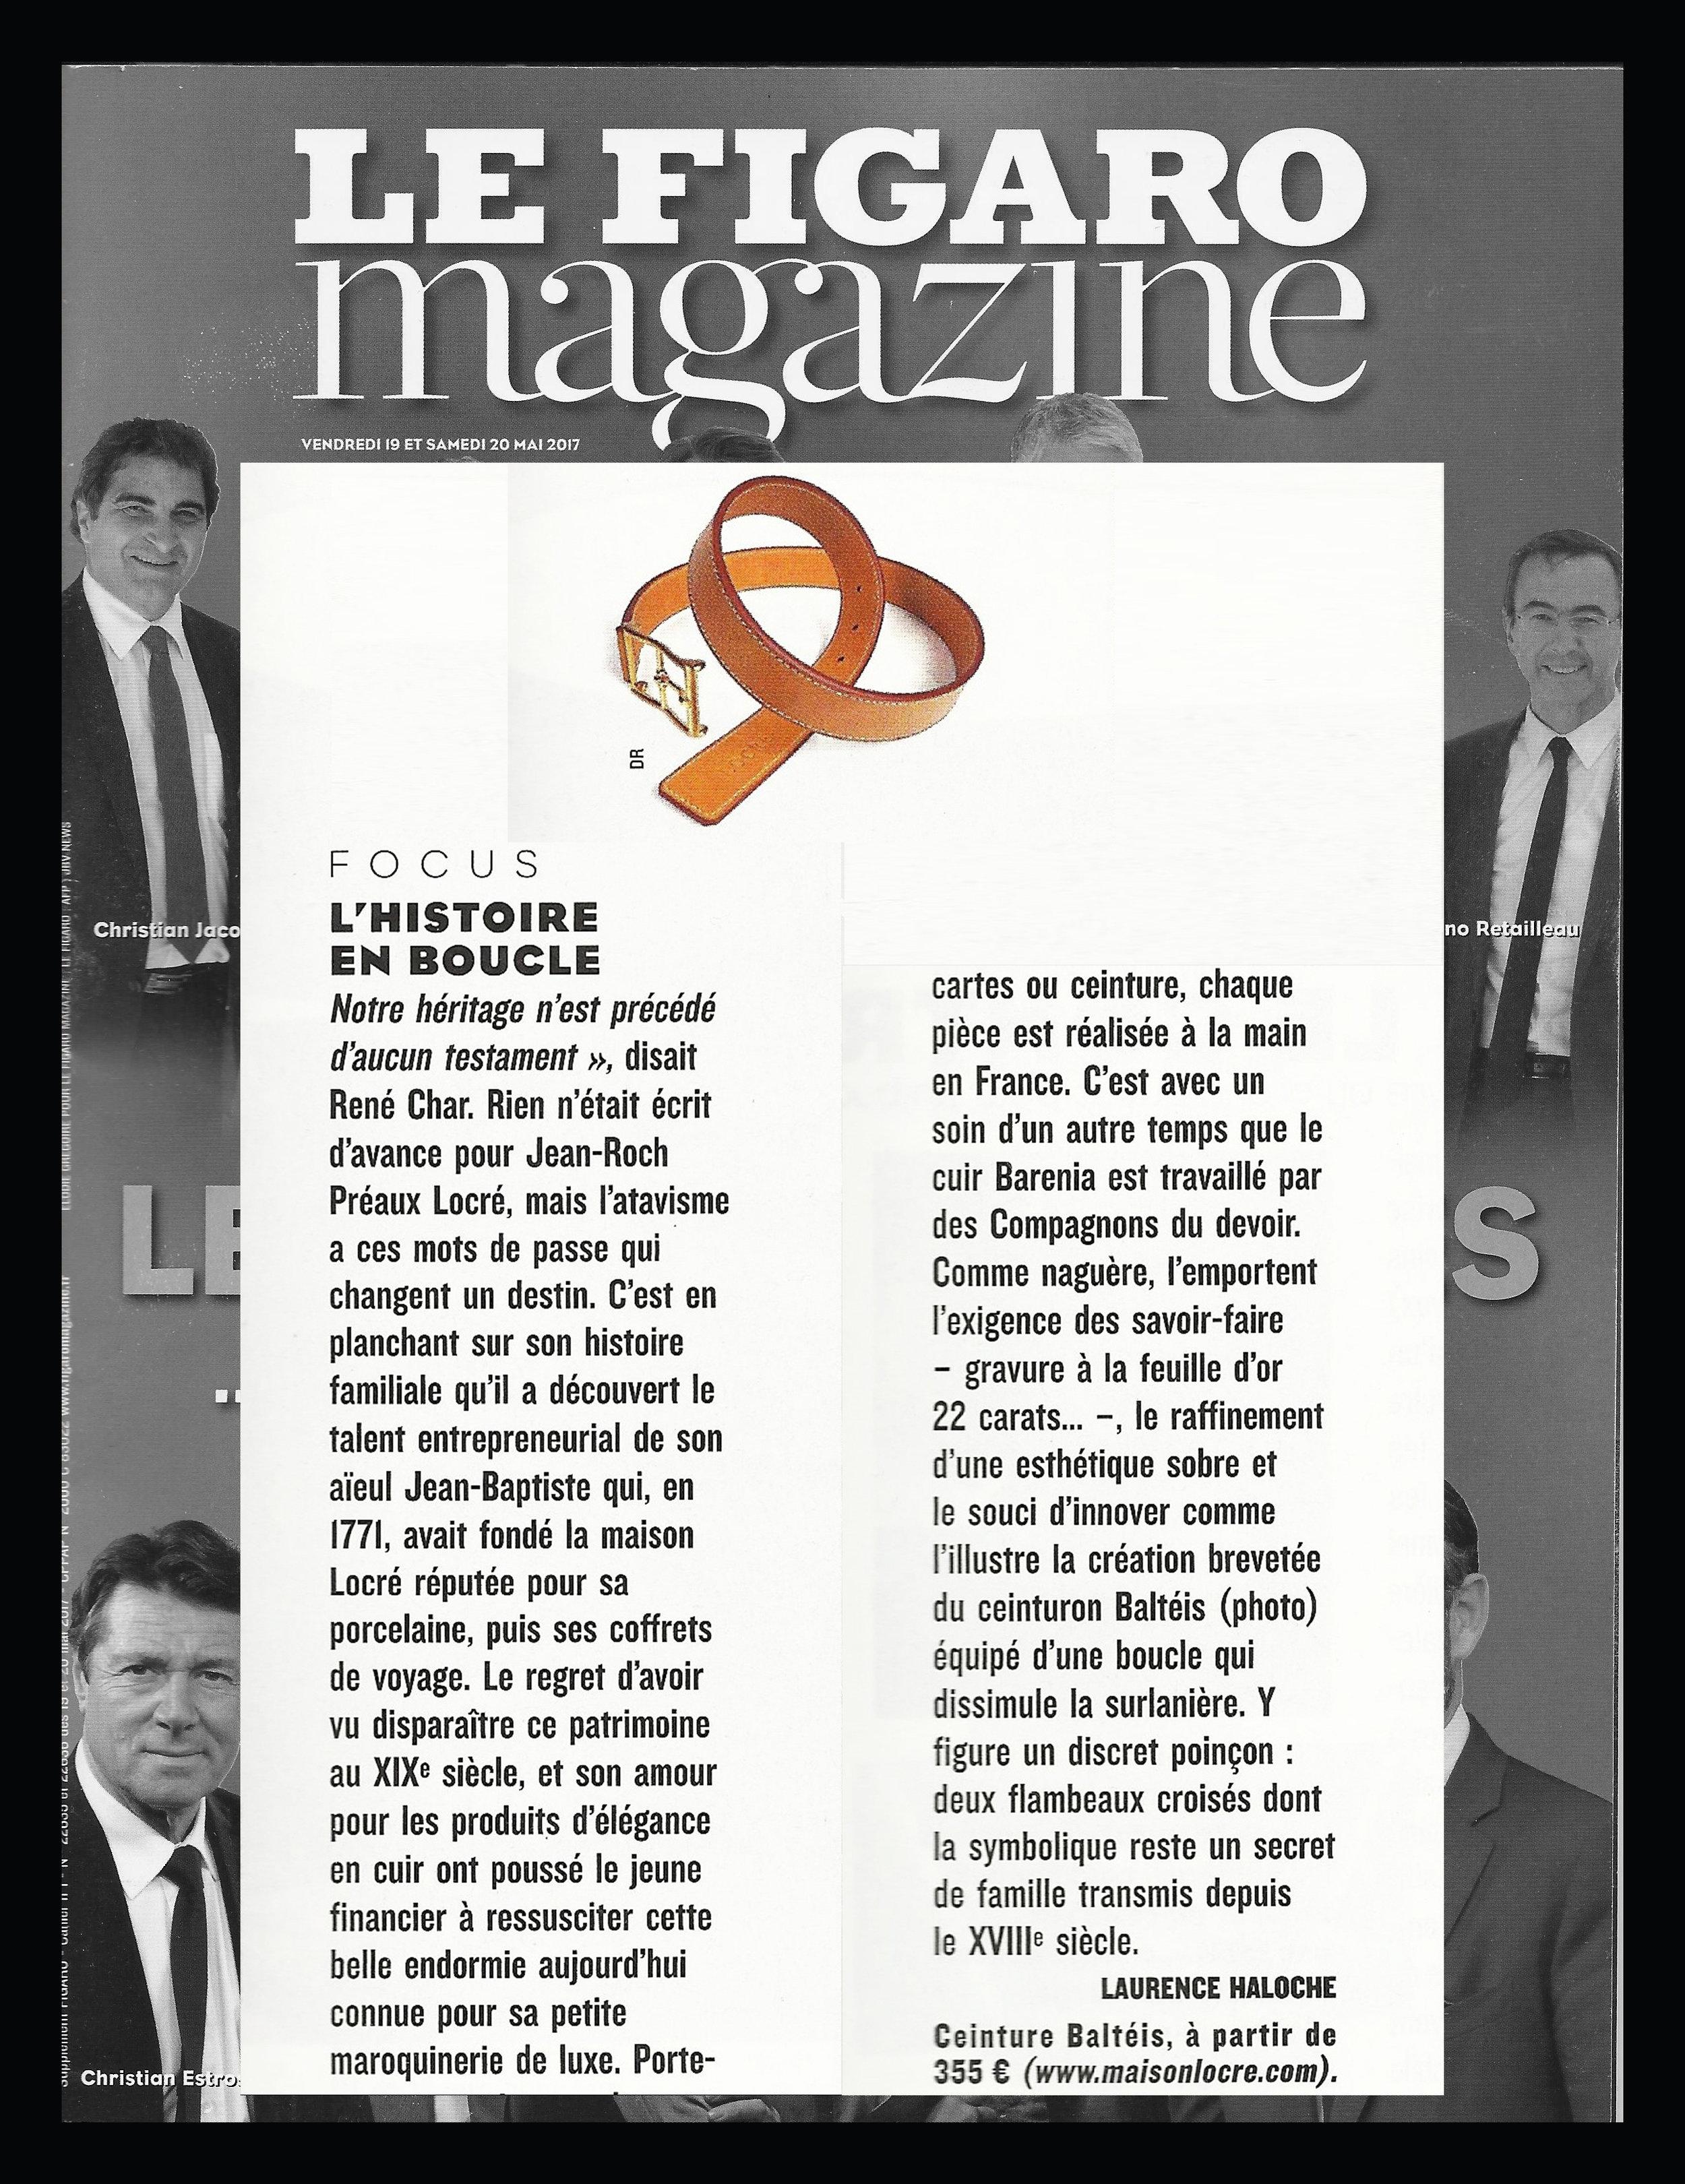 maison-locre-paris-le-figaro-magazine